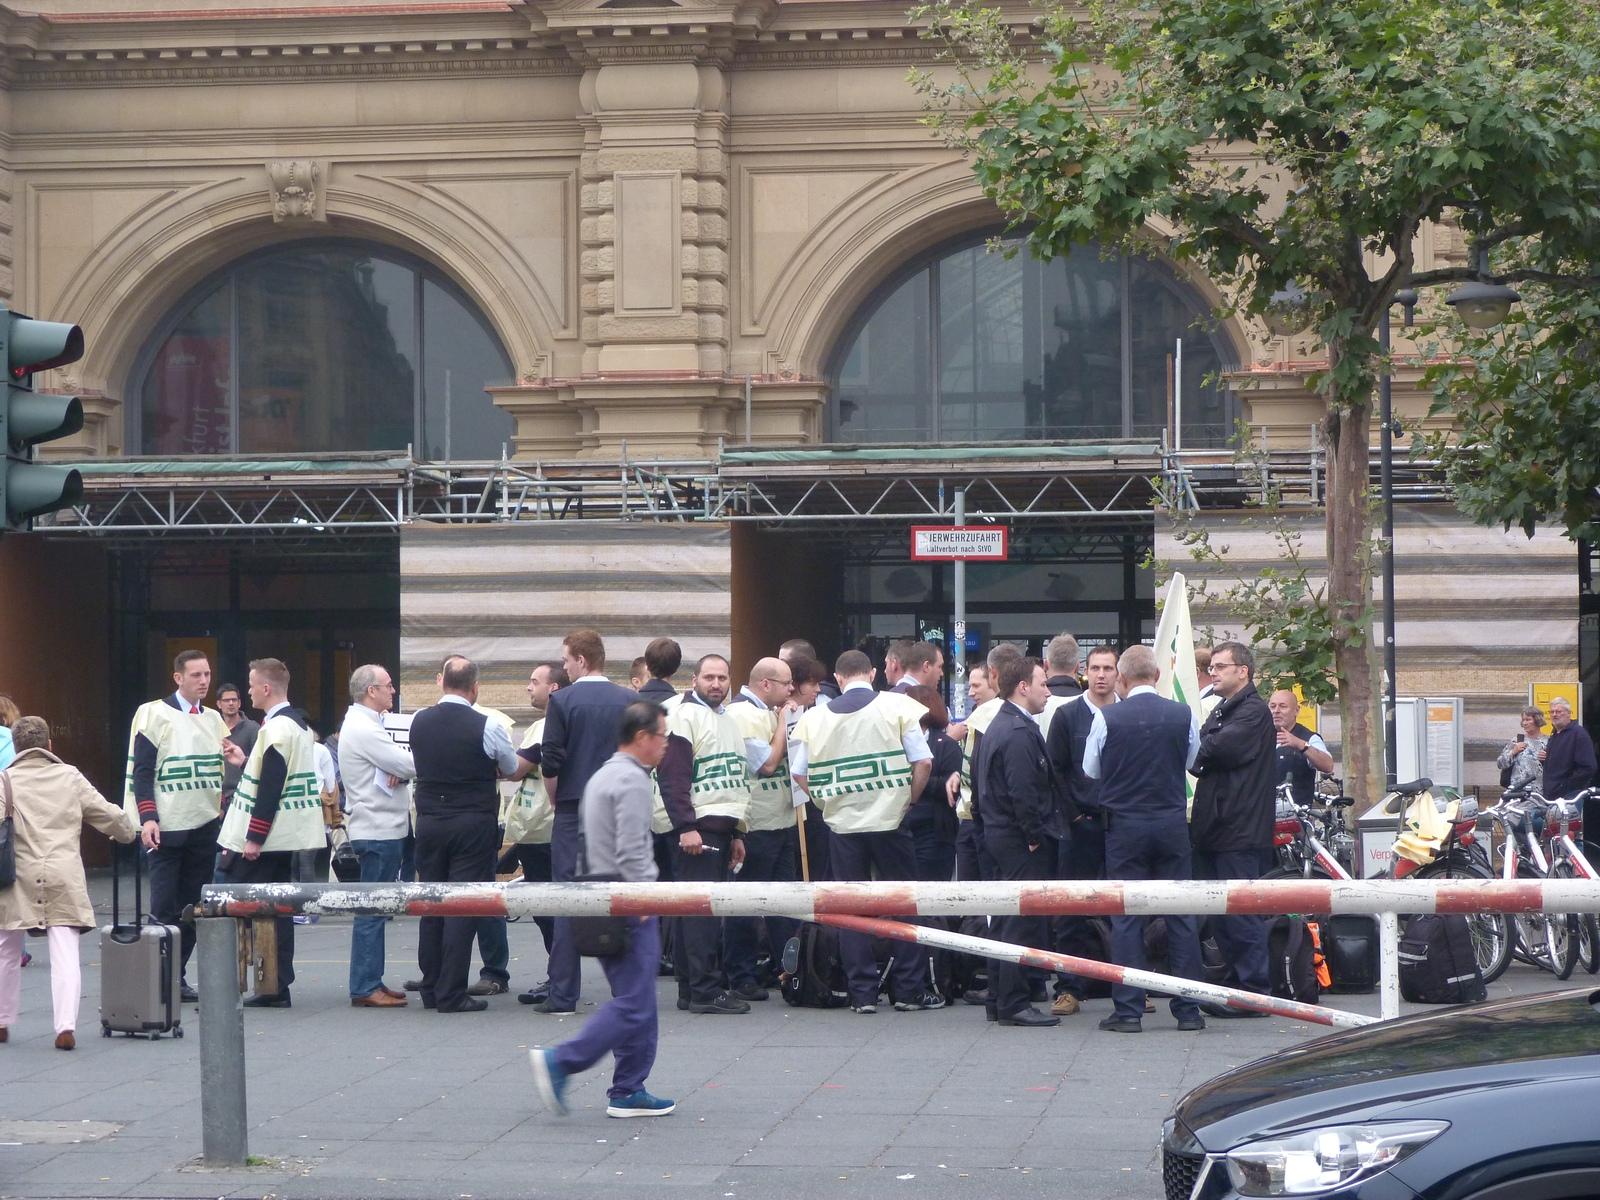 Streikende der GDL vor dem Frankfurter Hauptbahnhof